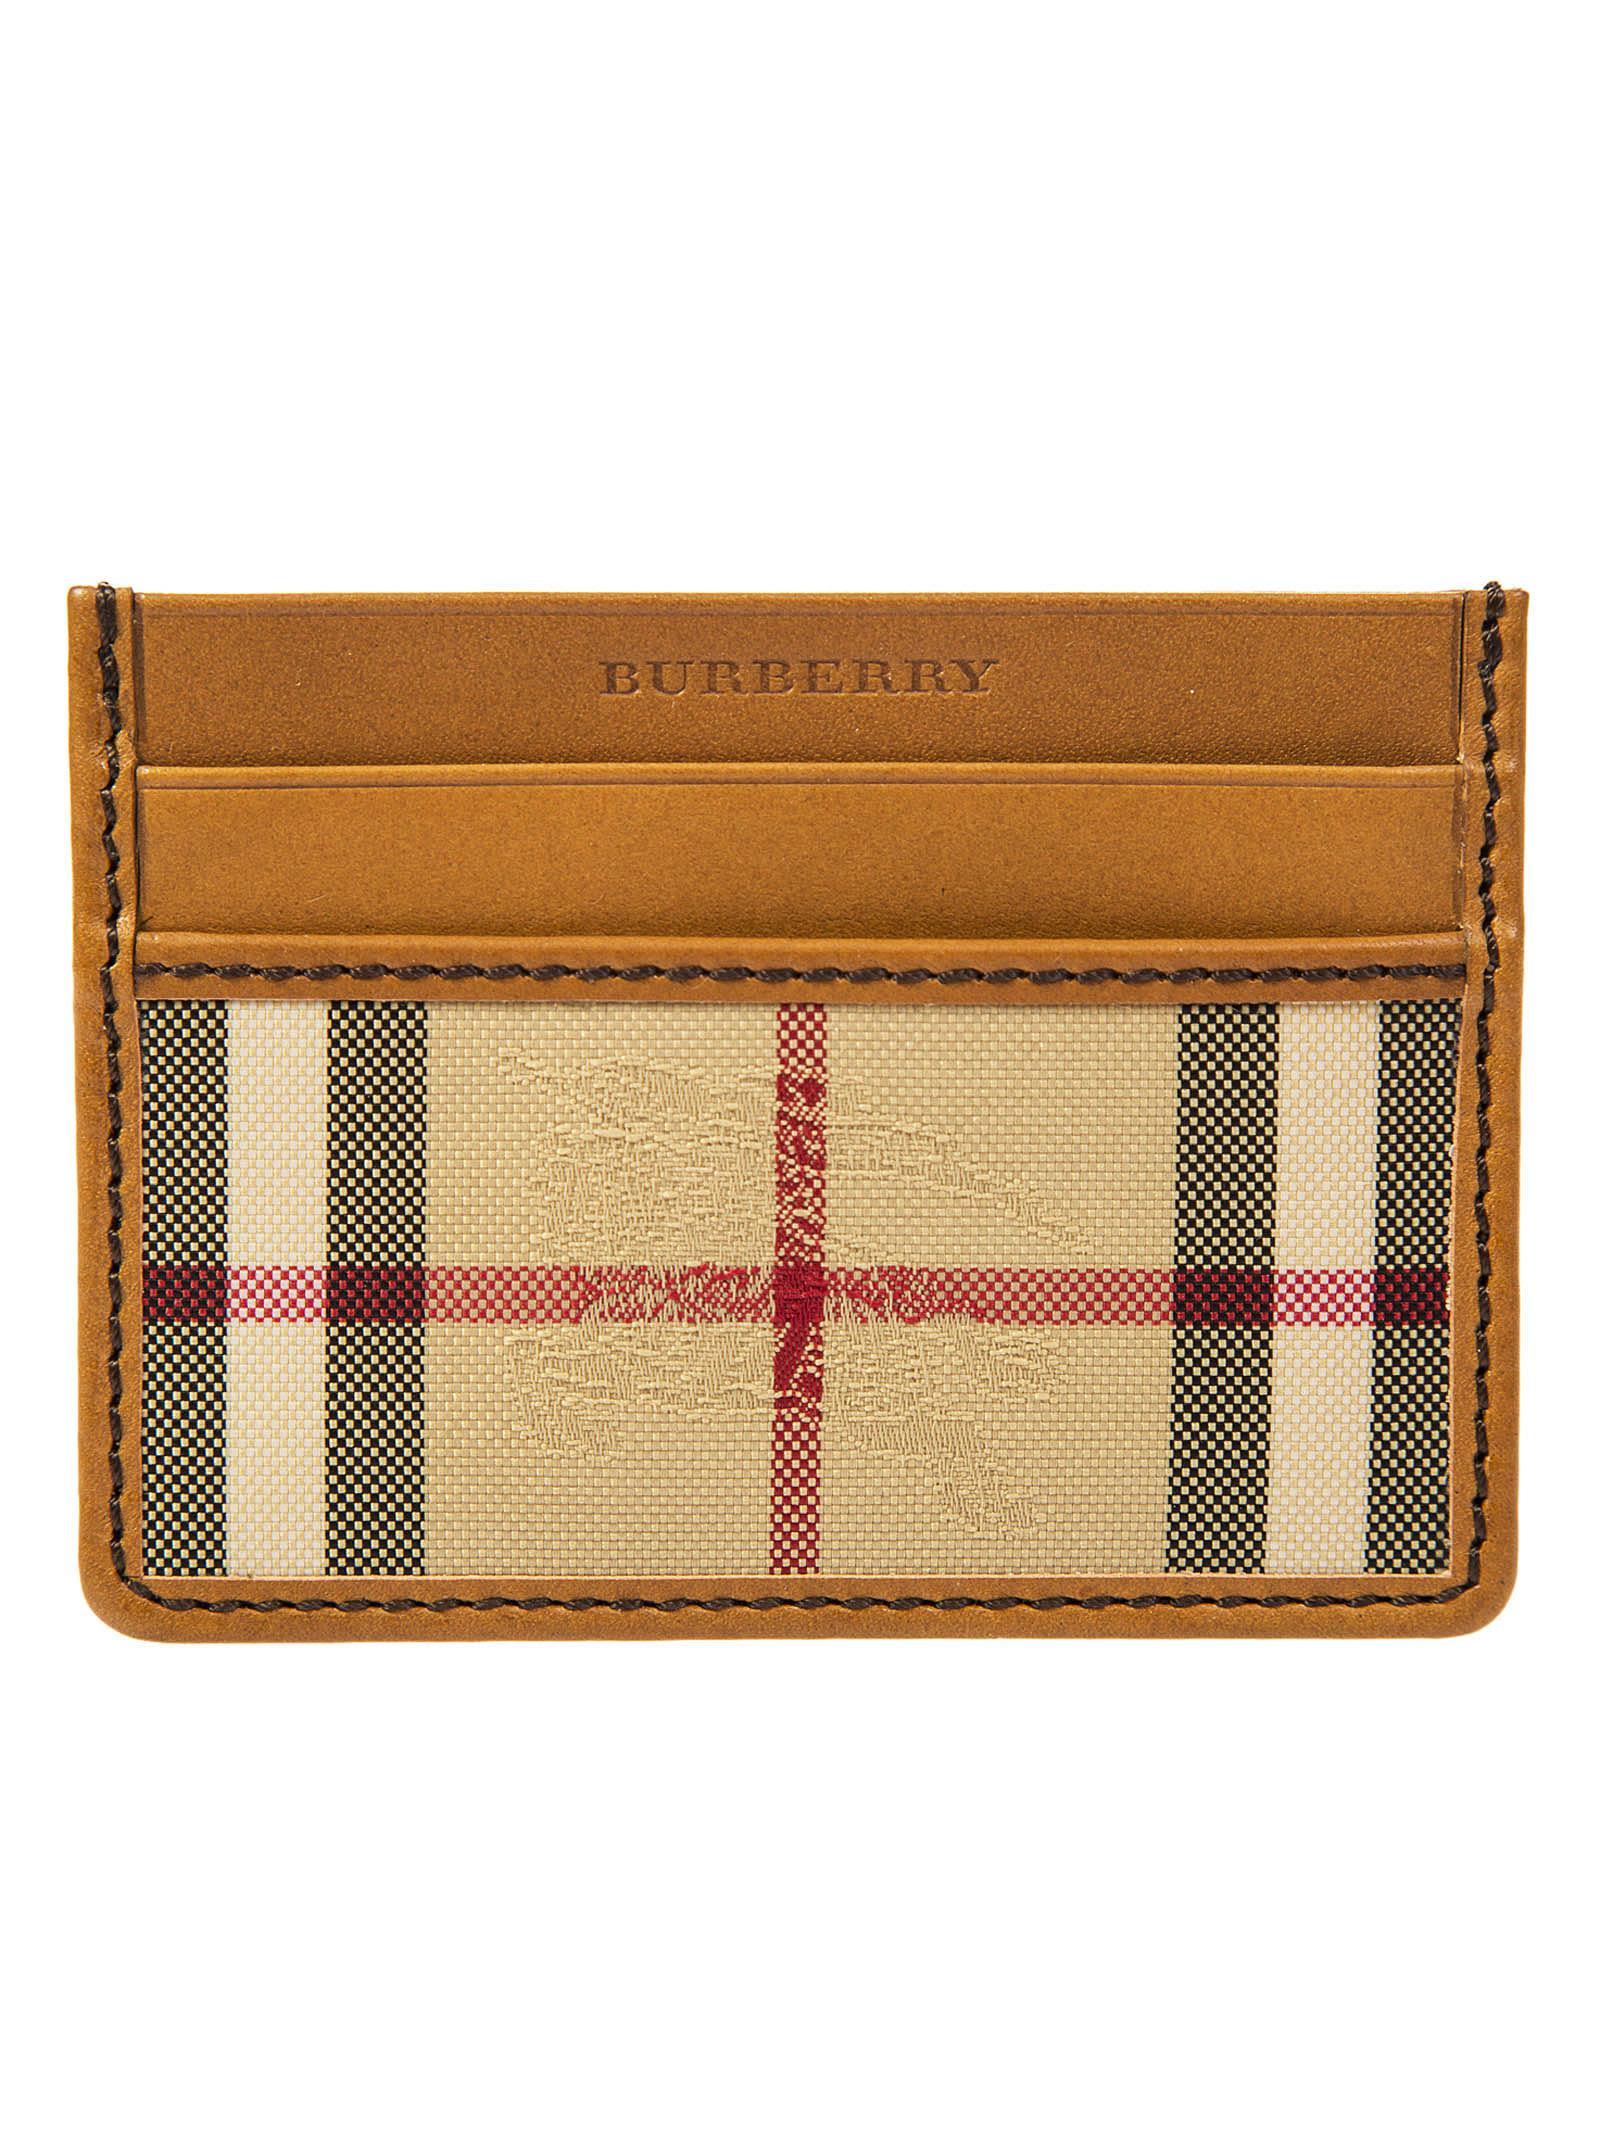 Burberry Horseferry Check Cardholder